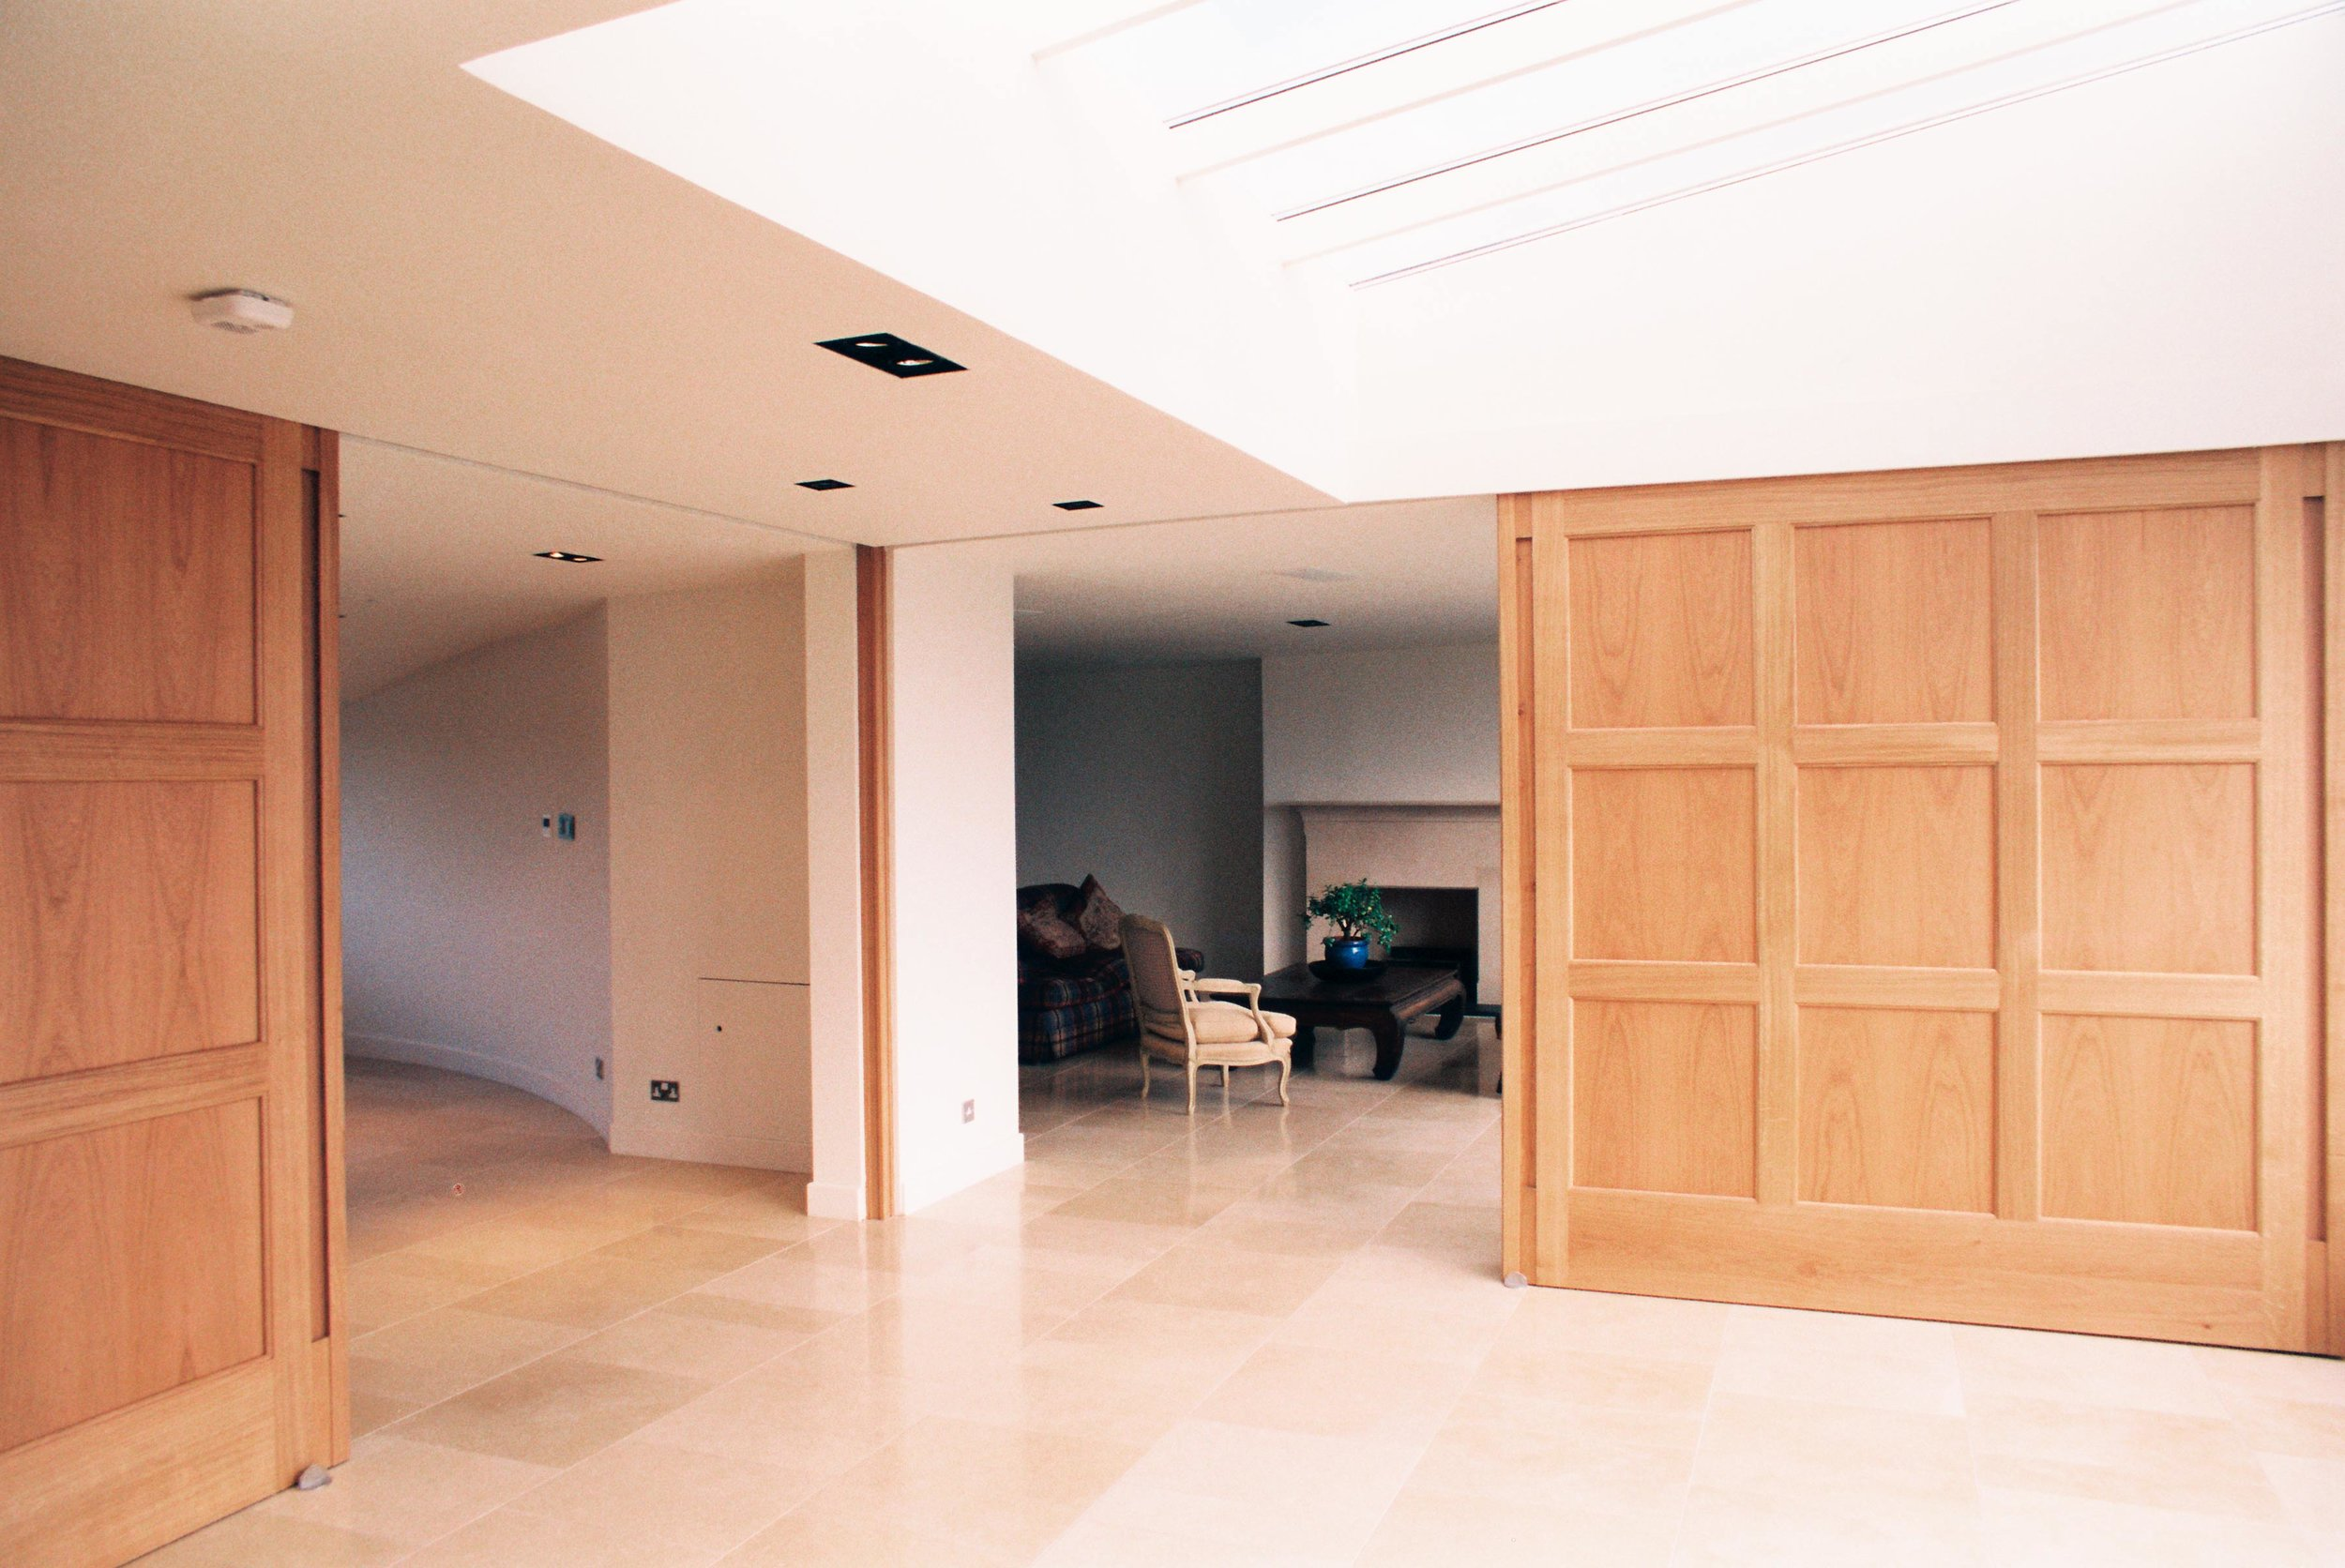 Contemporary sliding room divider in oak, private apartment, Inverleith Edinburgh.